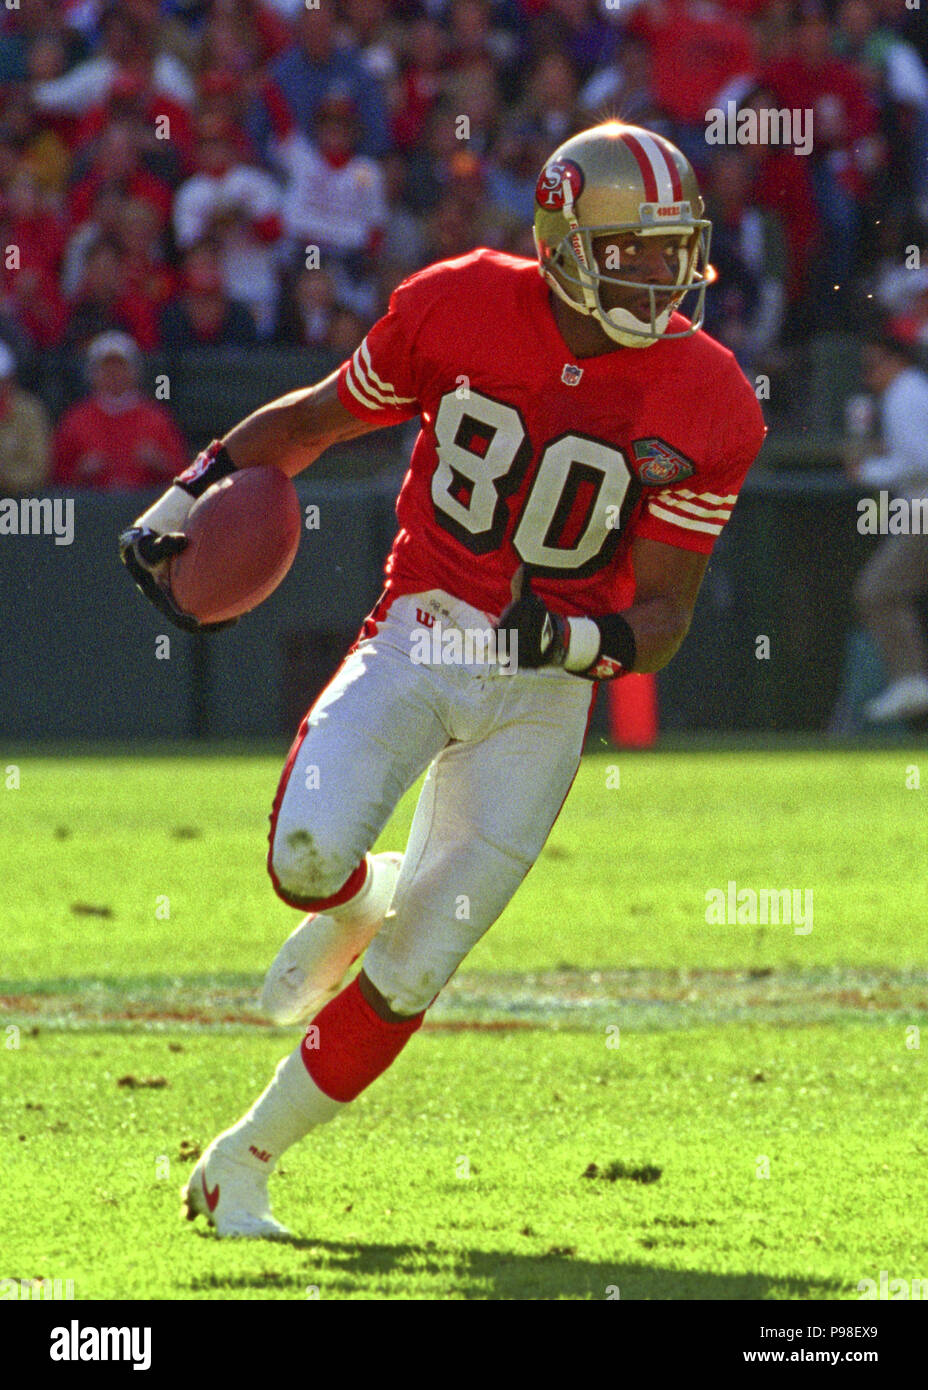 14633ba570d November 13, 1994 - San Francisco, California, U.S - San Francisco 49ers  vs. Dallas Cowboys at Candlestick Park Sunday, November 13, 1994.